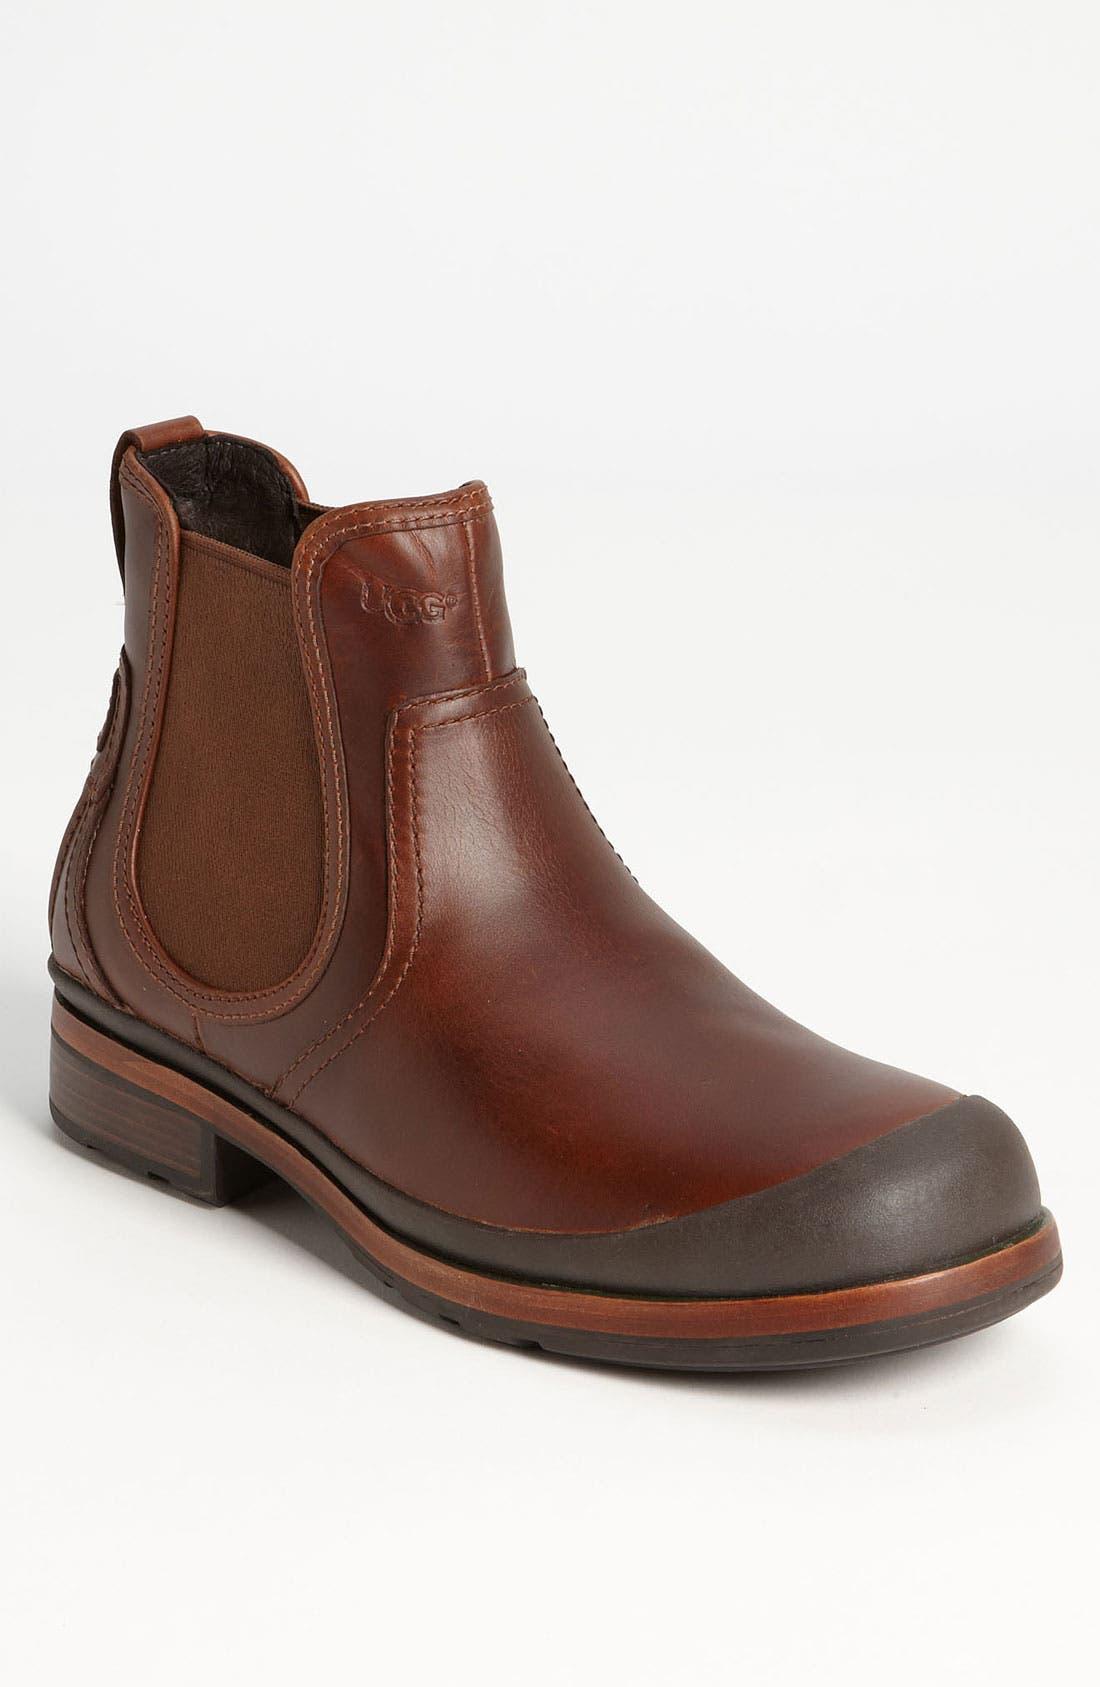 Alternate Image 1 Selected - UGG® Australia 'Matteson' Chelsea Boot (Men)